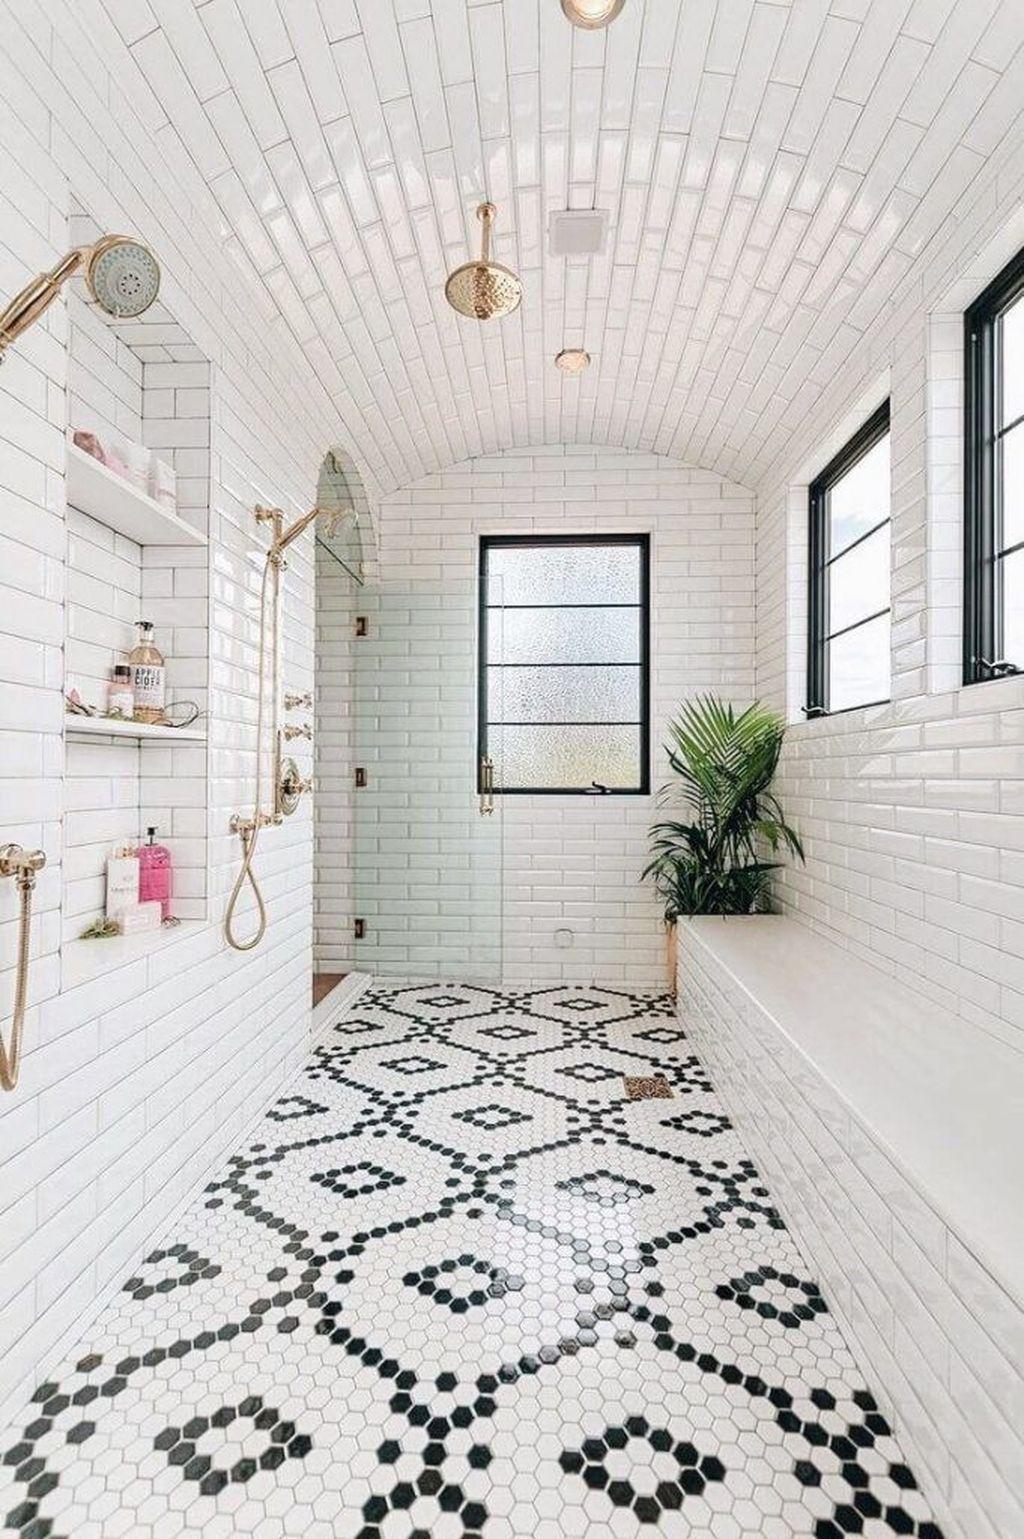 31 Inspiring Bathroom Tile Ideas Bathroom Tile Designs Bathroom Interior Design Bathroom Decor